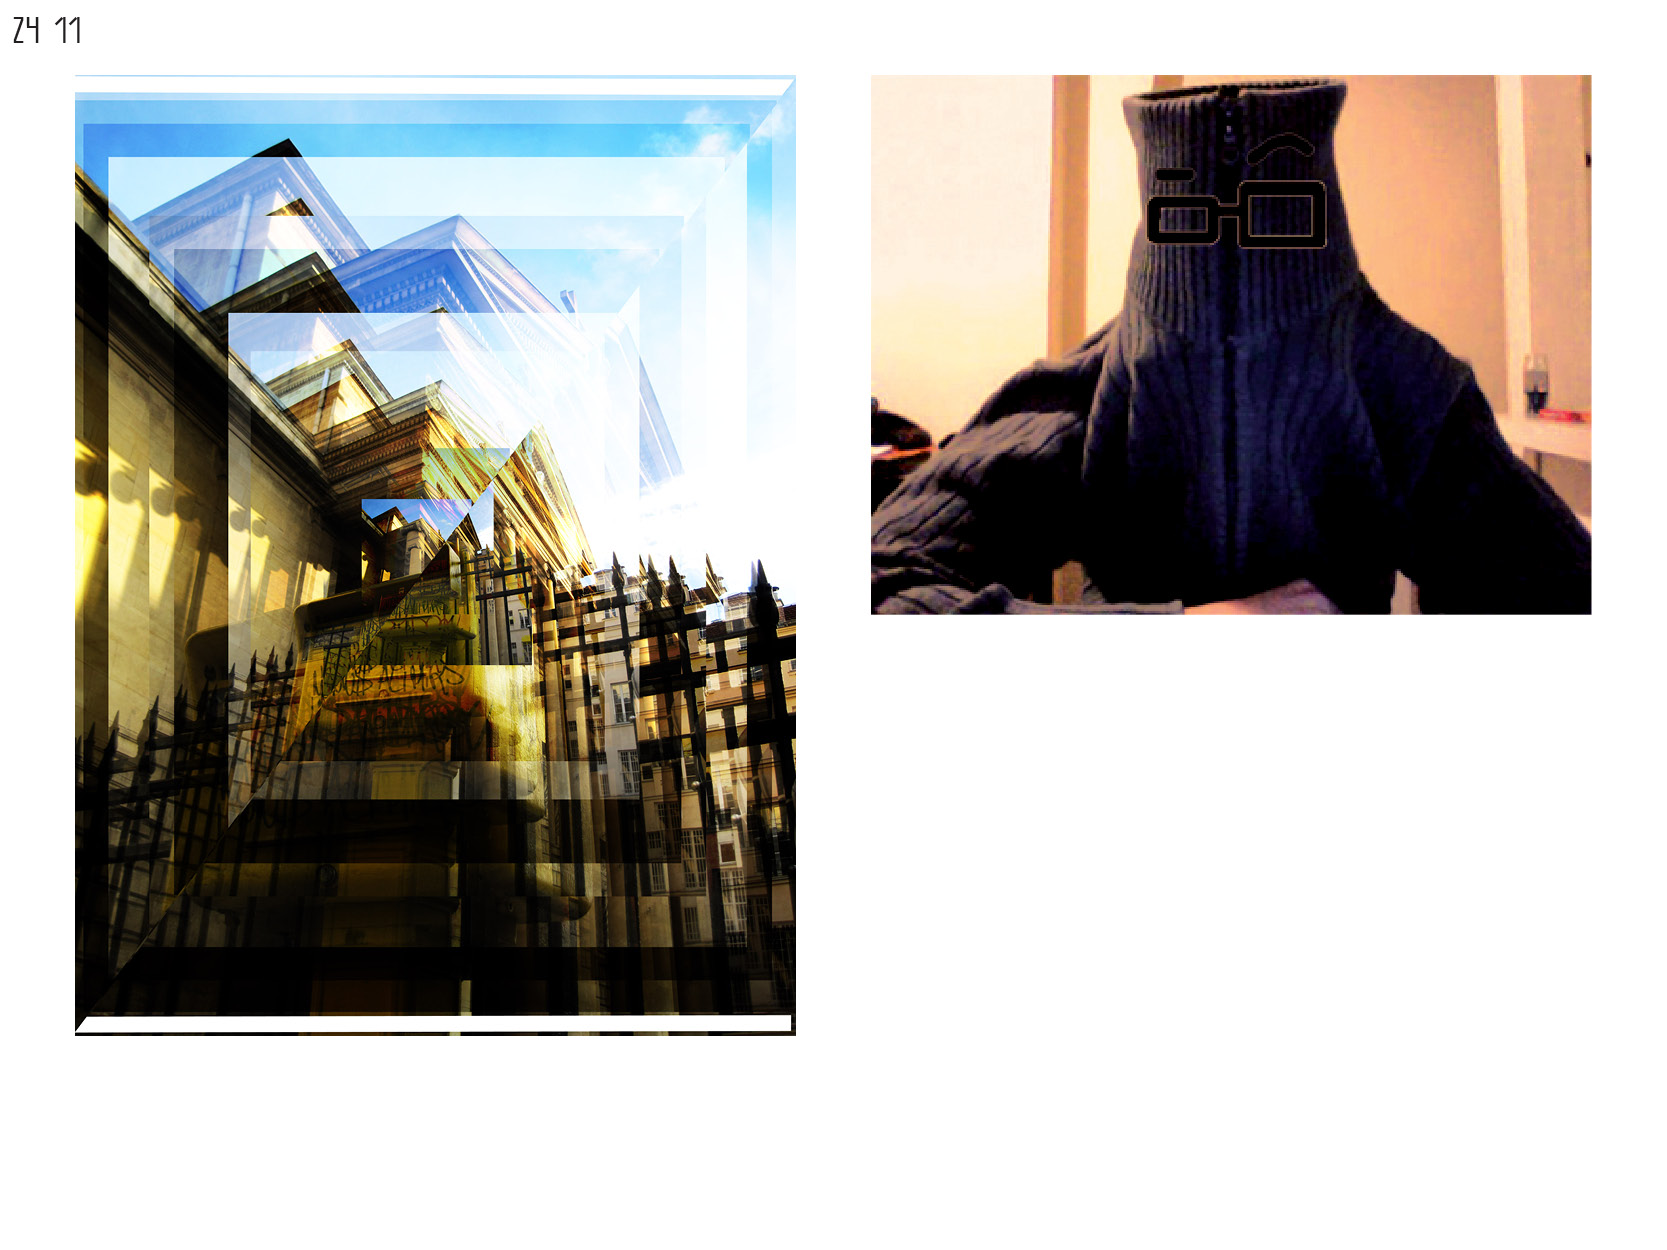 Gerrit-Schweiger-Dialog-Städte-Paris-Berlin-Jessica-Blank-Experiment-Fotoserie-Tagebuch-visuelle-Kommunikation-39